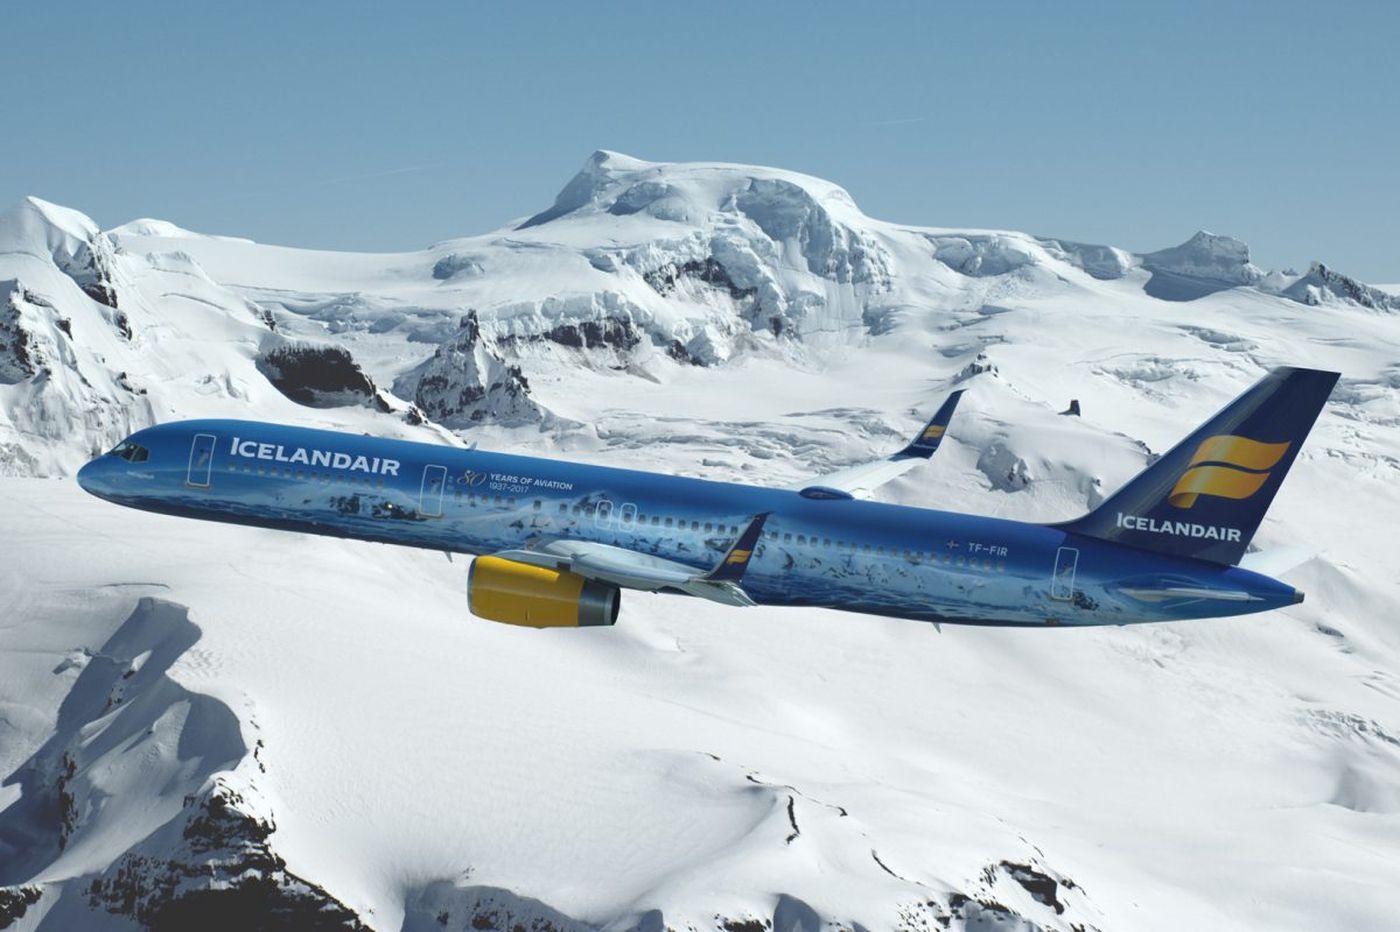 First Icelandair flight arrives at PHL